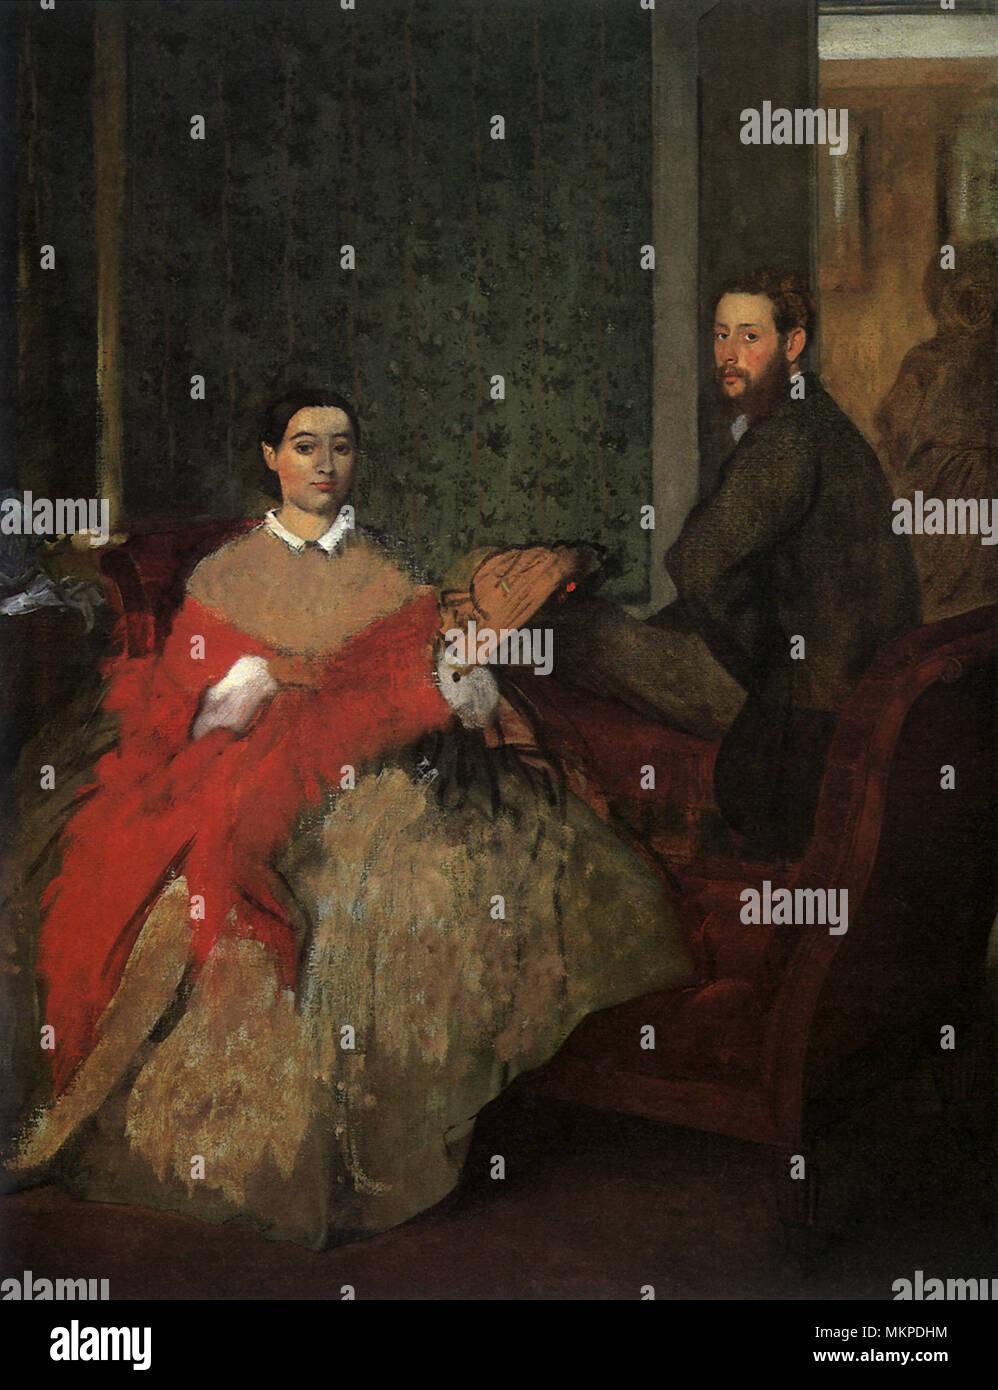 Edmondo and Thérèse Morbilli - Stock Image